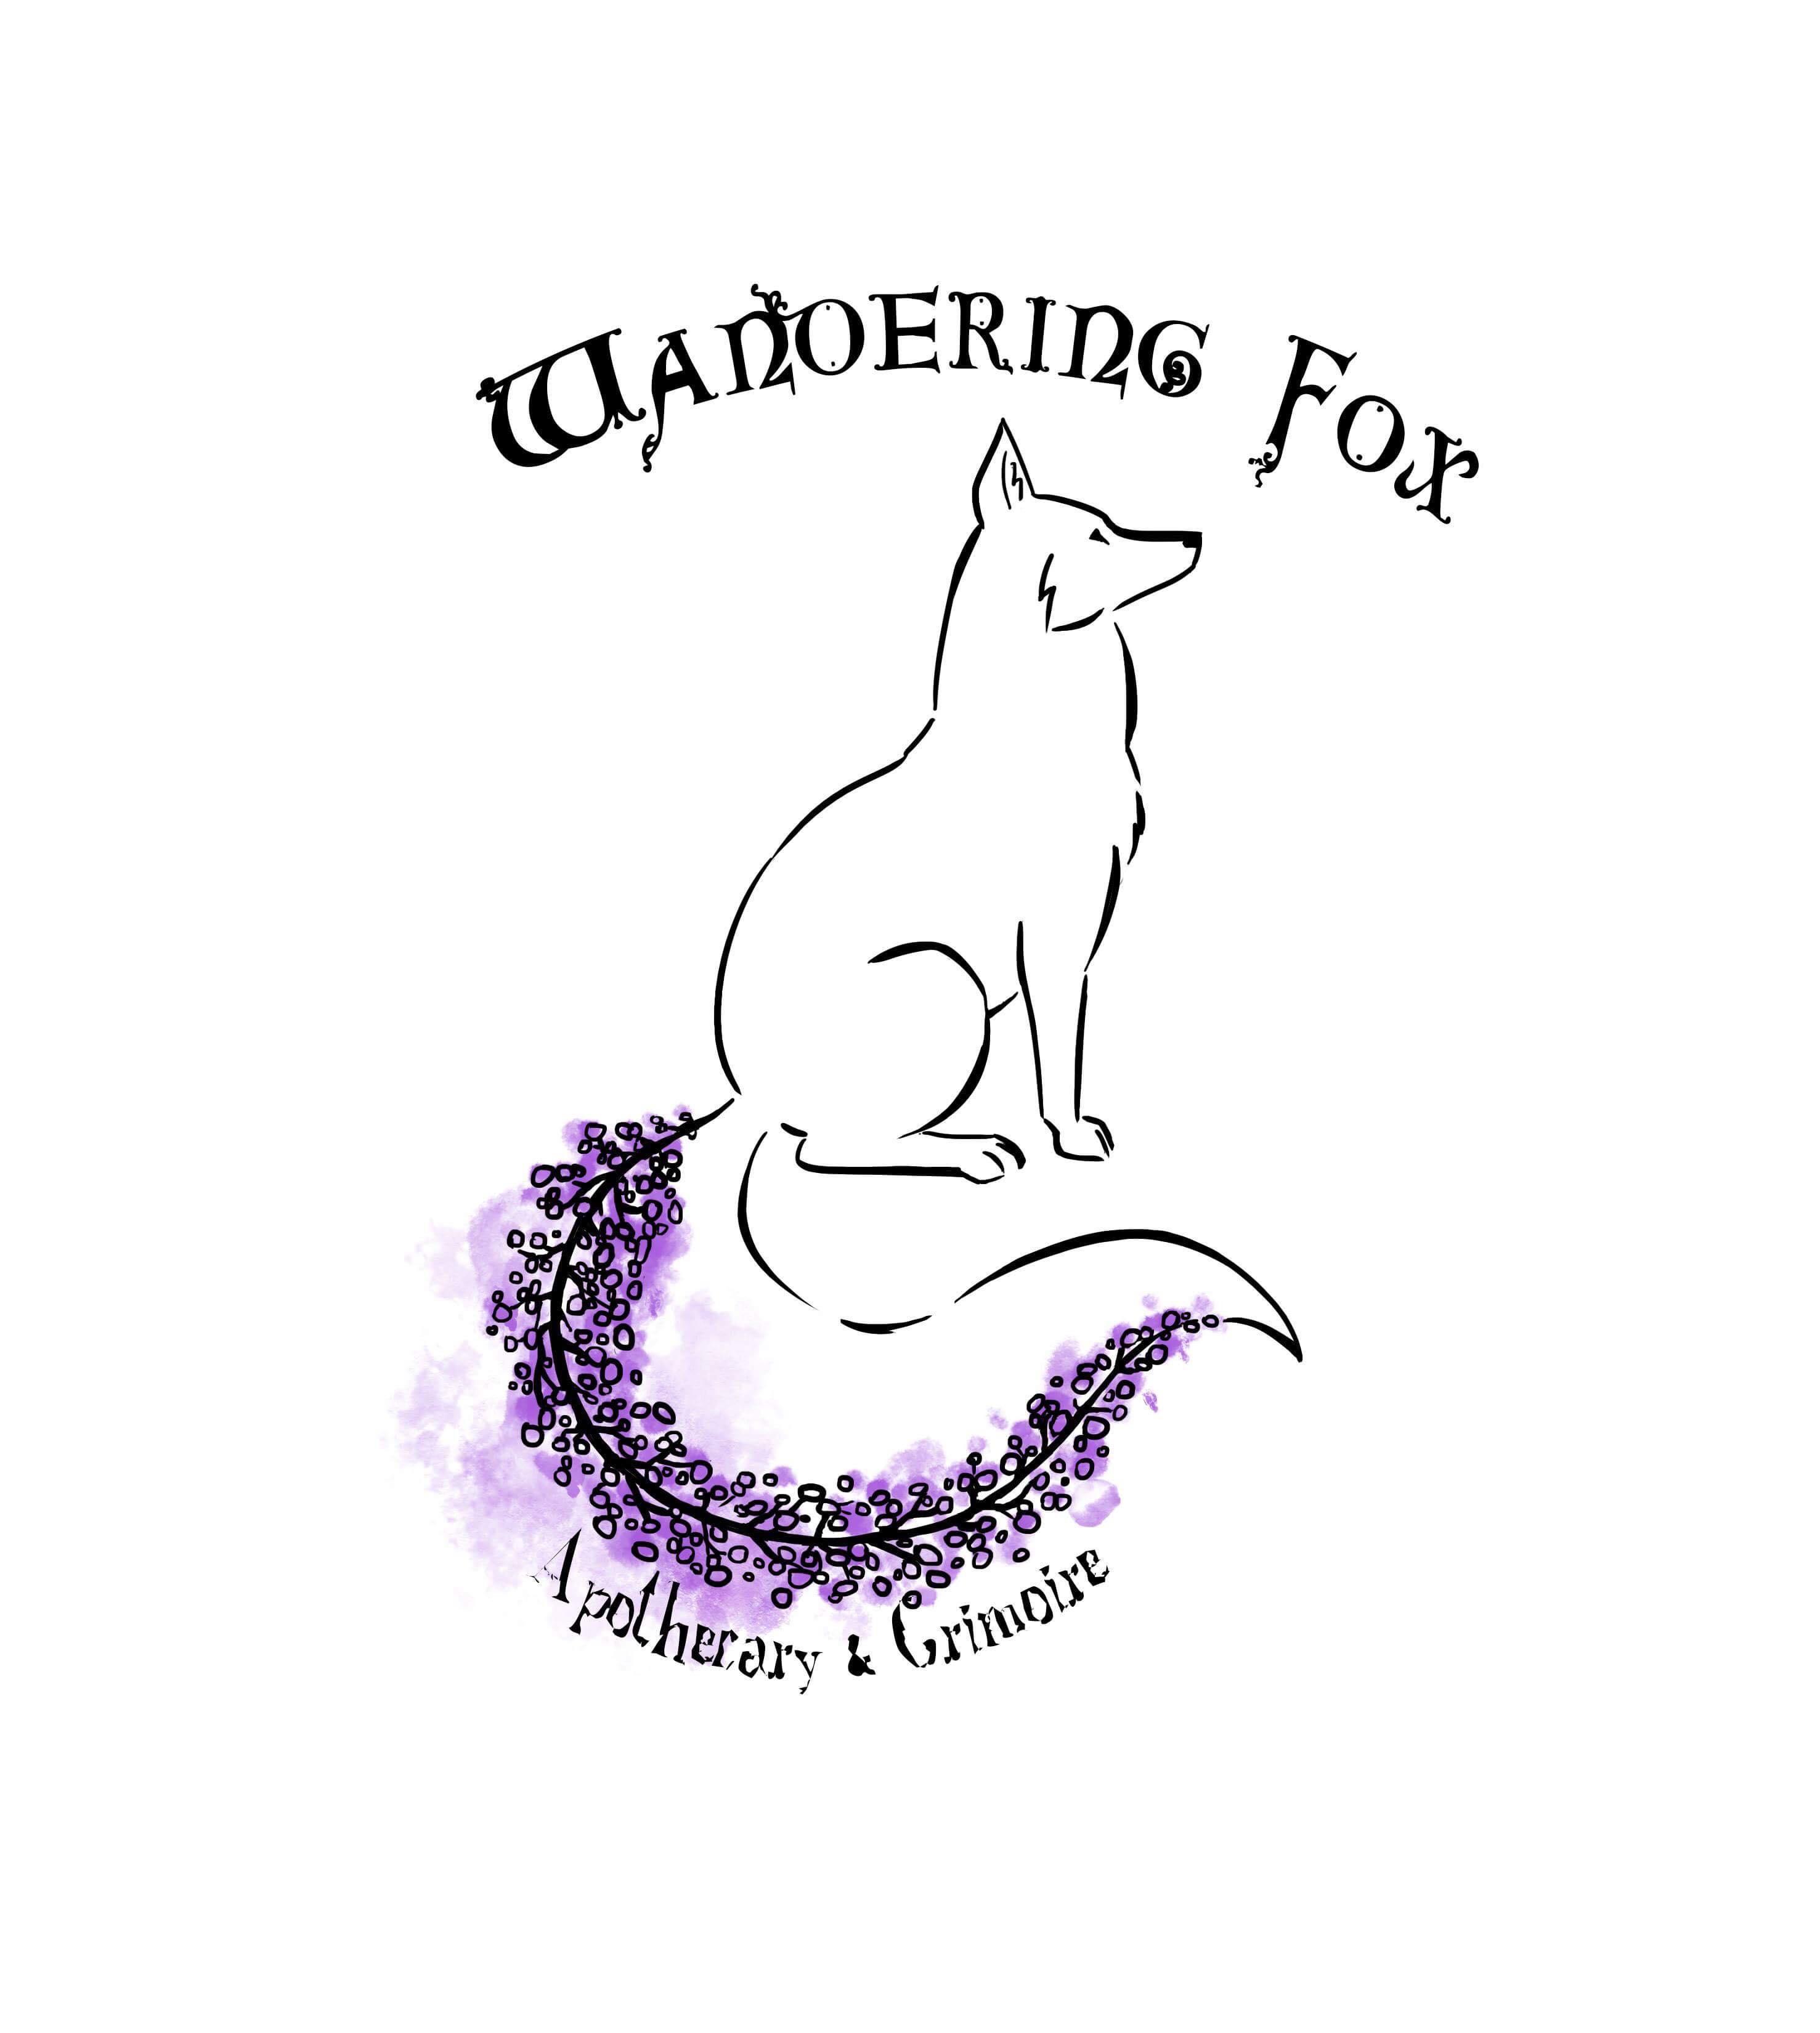 Wandering fox logo